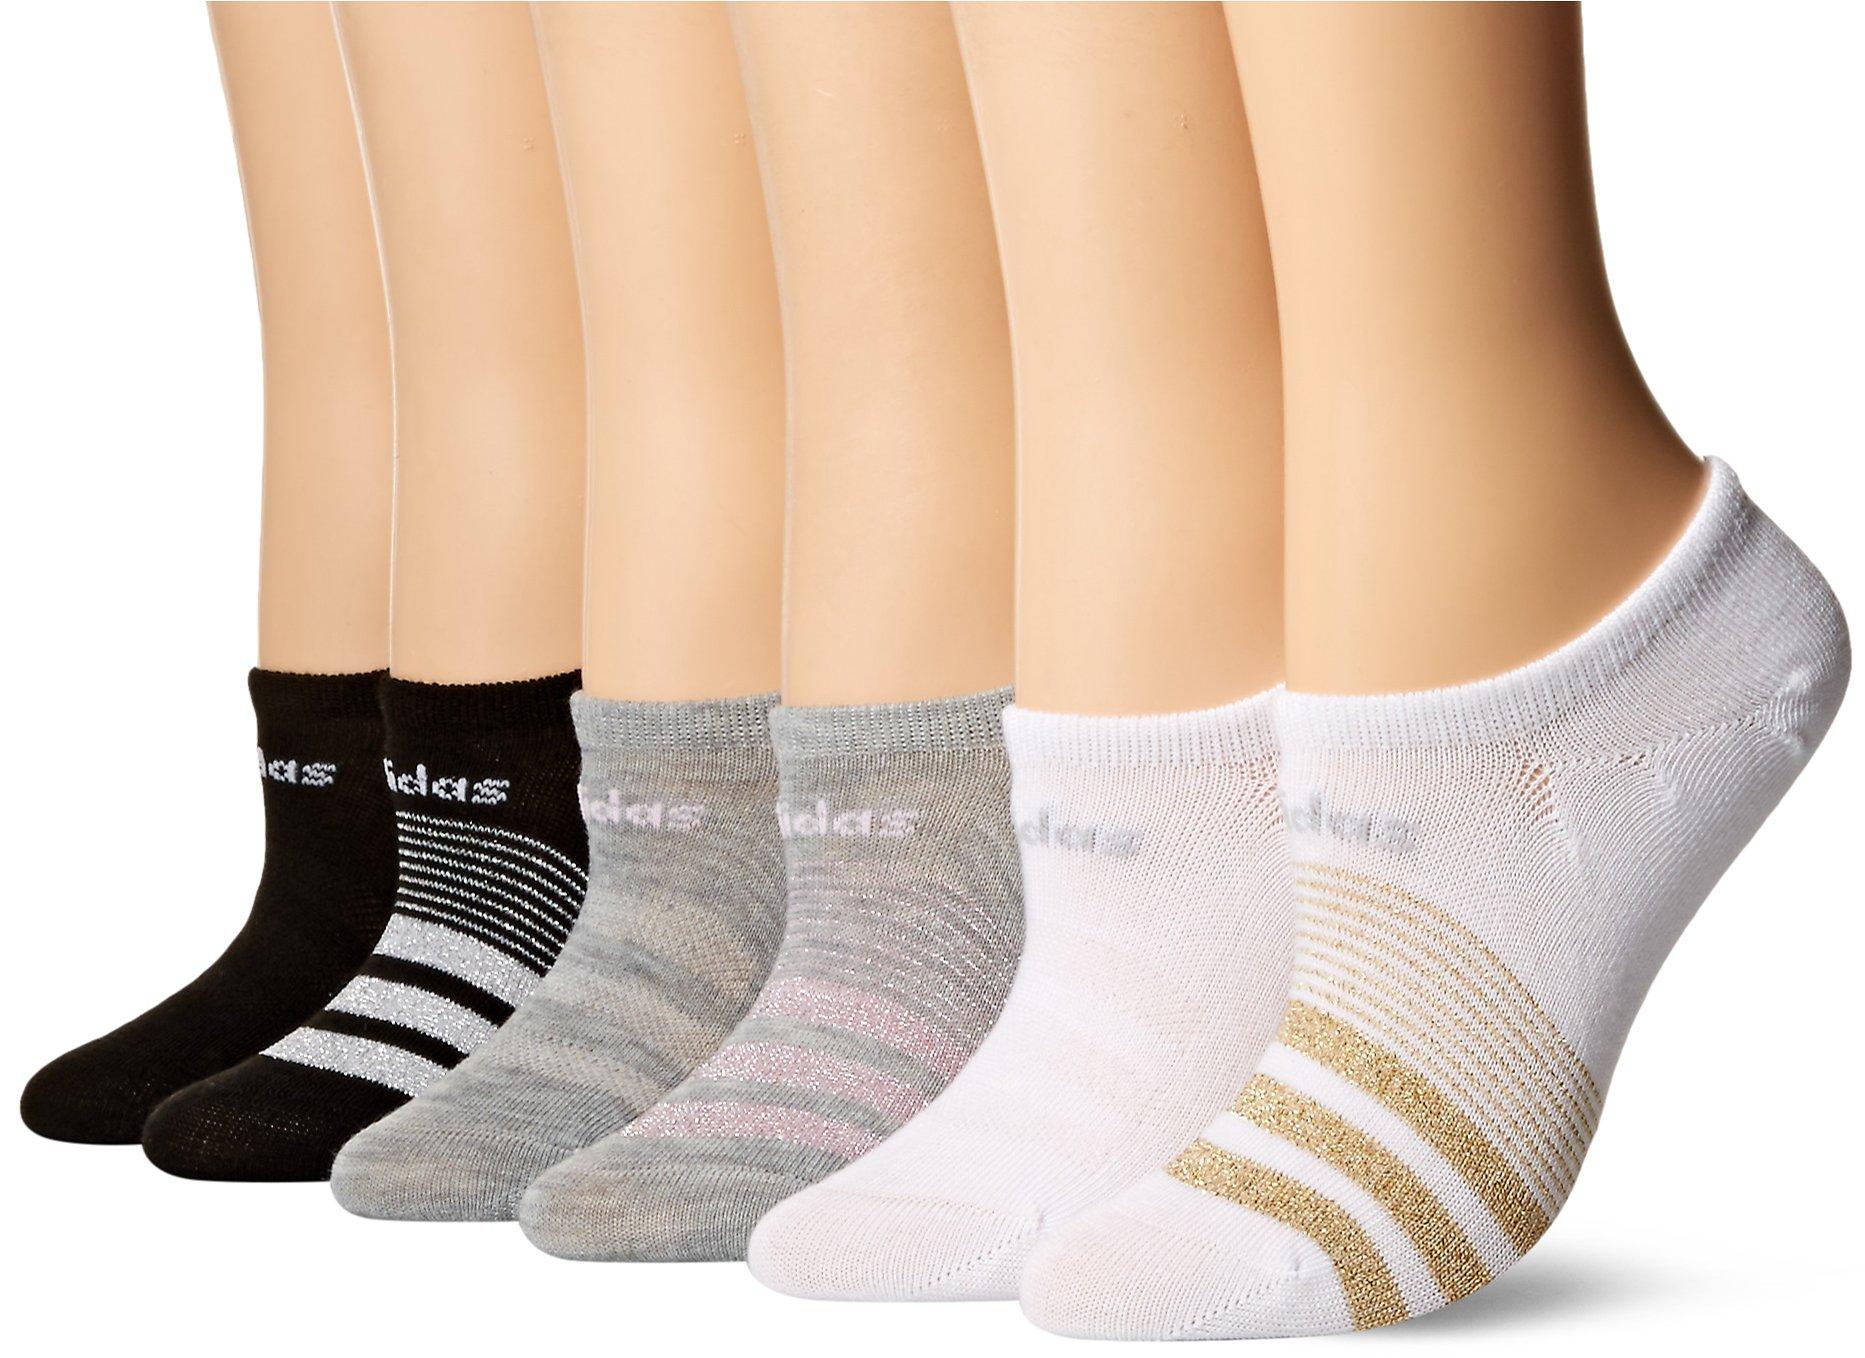 adidas Women's Superlite Super No Show Socks (6-Pair), White/Gold Lurex/Clear Onix Light Heather Grey/Aer, Medium, (Shoe Size 5-10) by adidas